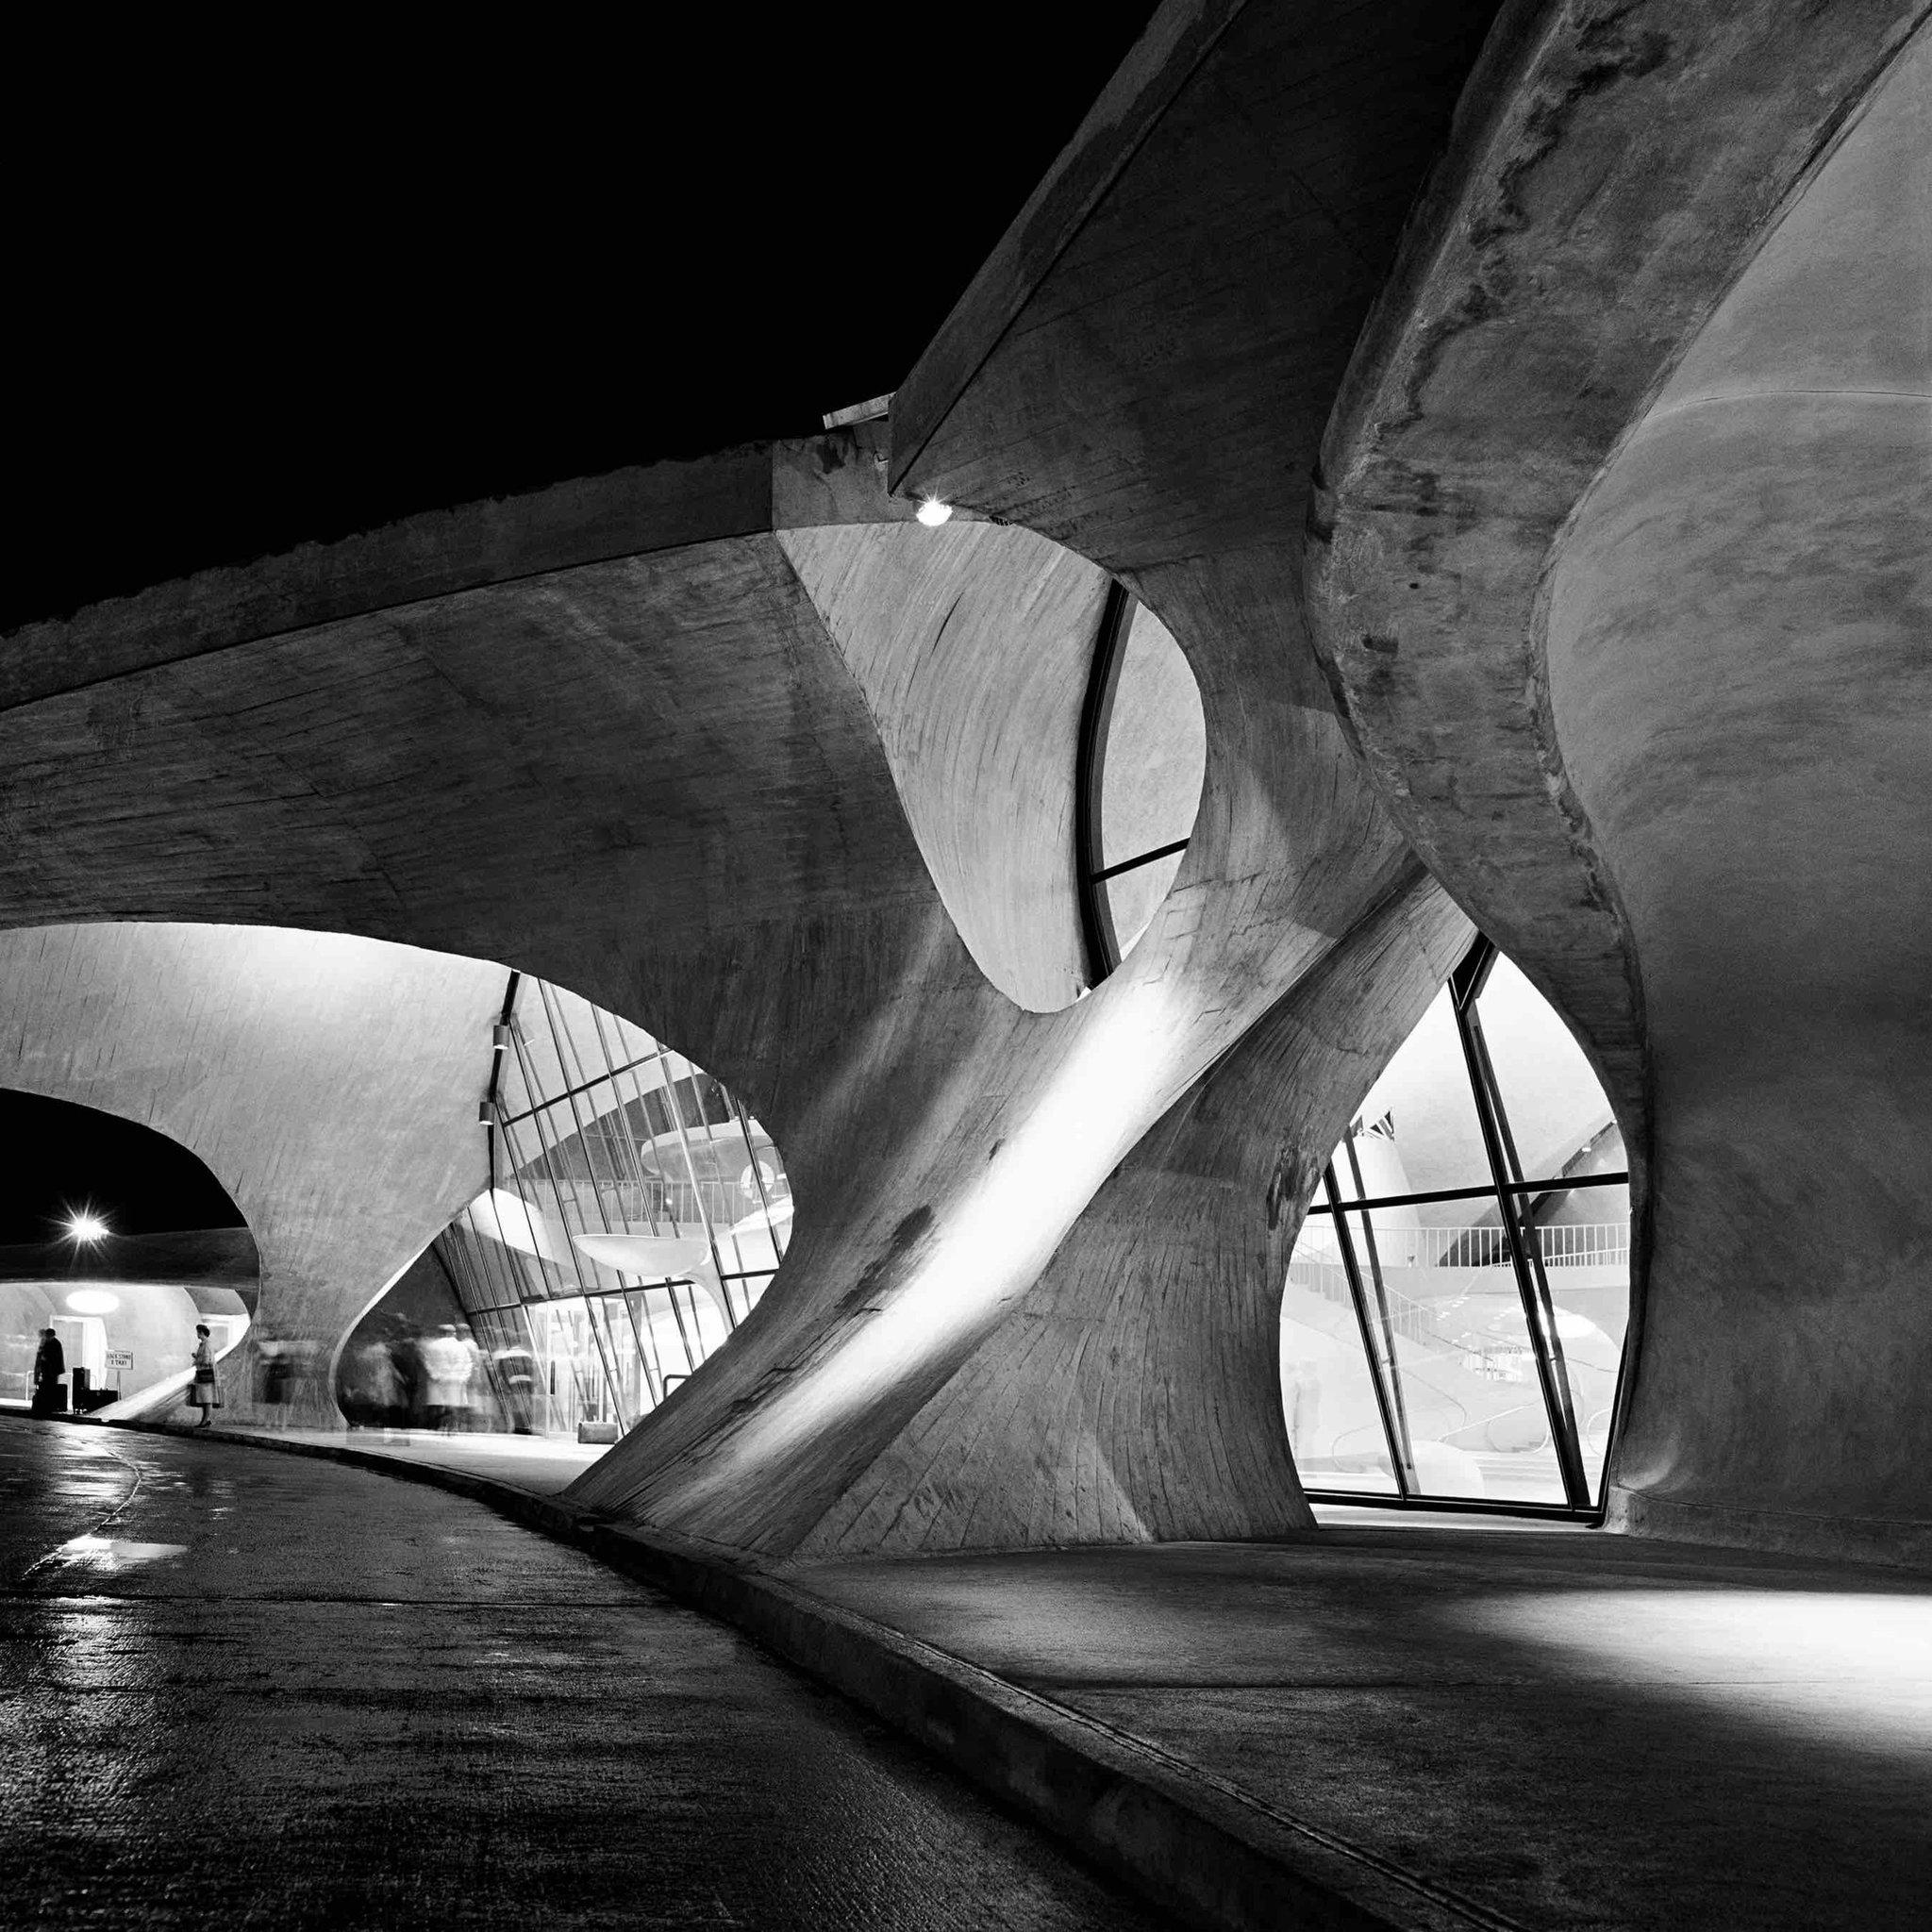 Eero Saarinen's TWA Terminal at JFK Airport, New York, 1965 - Balthazar Korab